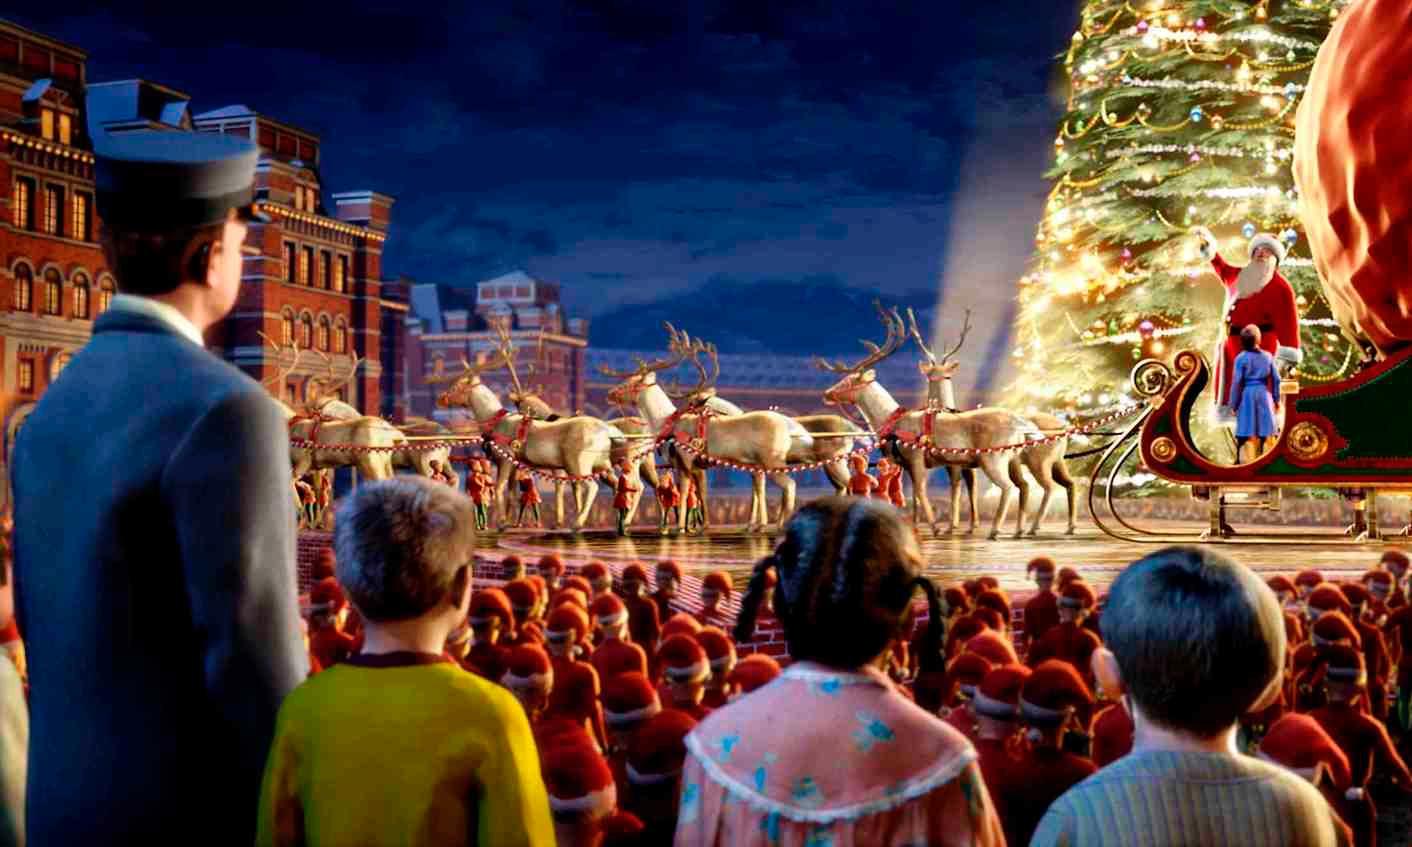 Christmas Movie List:婉拒狂歡的聚會邀請。享受一個人的聖誕電影夜 ‧ A Day Magazine